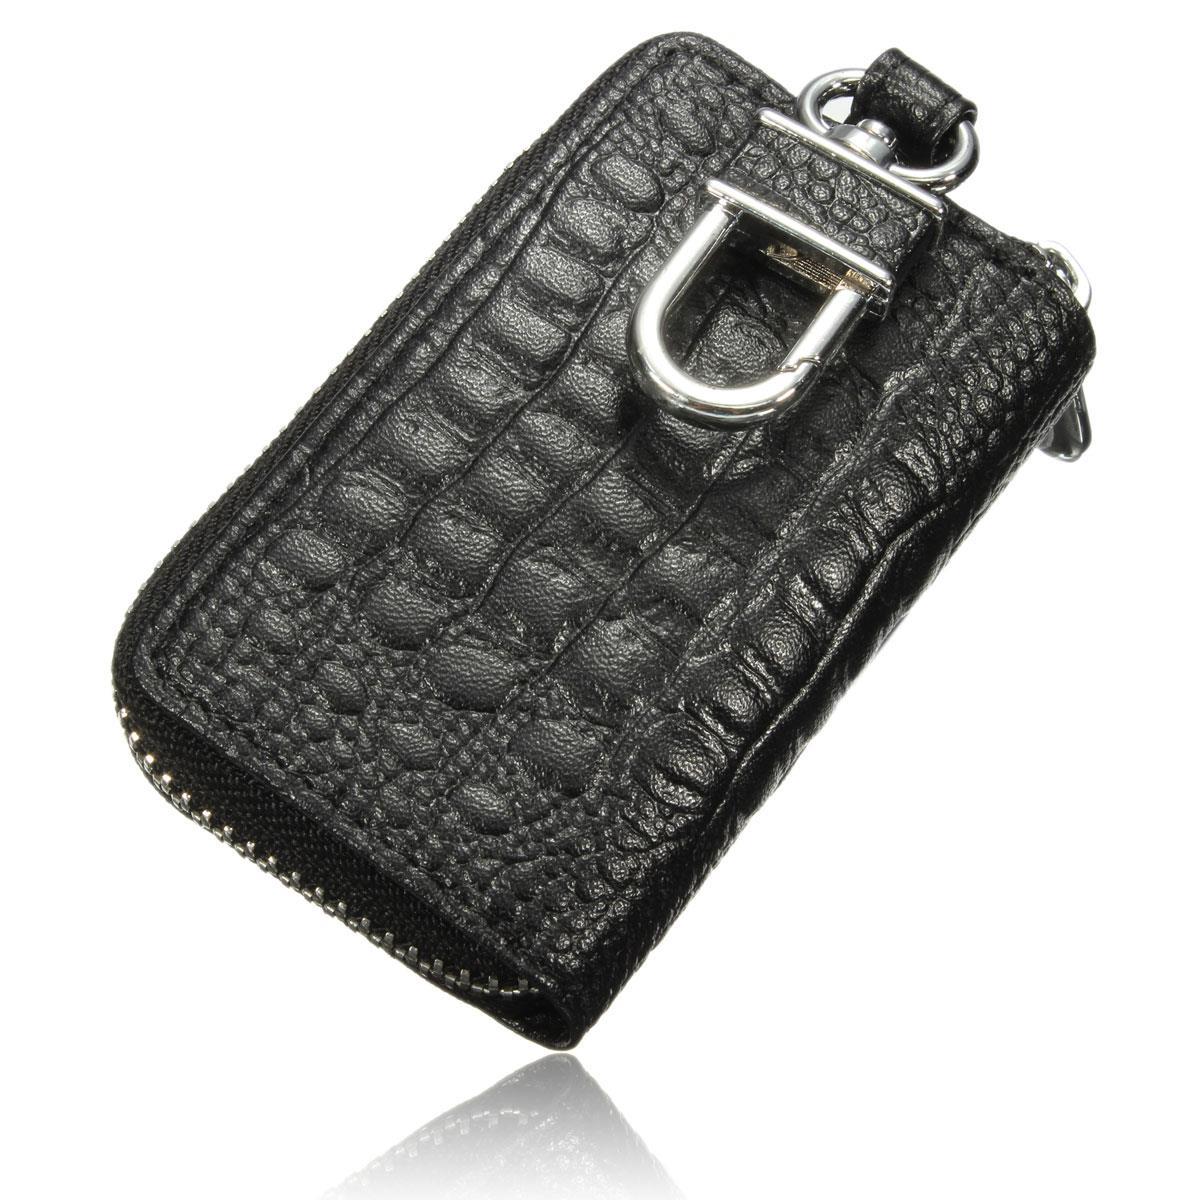 Hot Car Key Wallets Women Men Faux Leather Keychain Holder Bag Keys Purse Case High Quality 4 Colors Bump Texture Portable(China (Mainland))